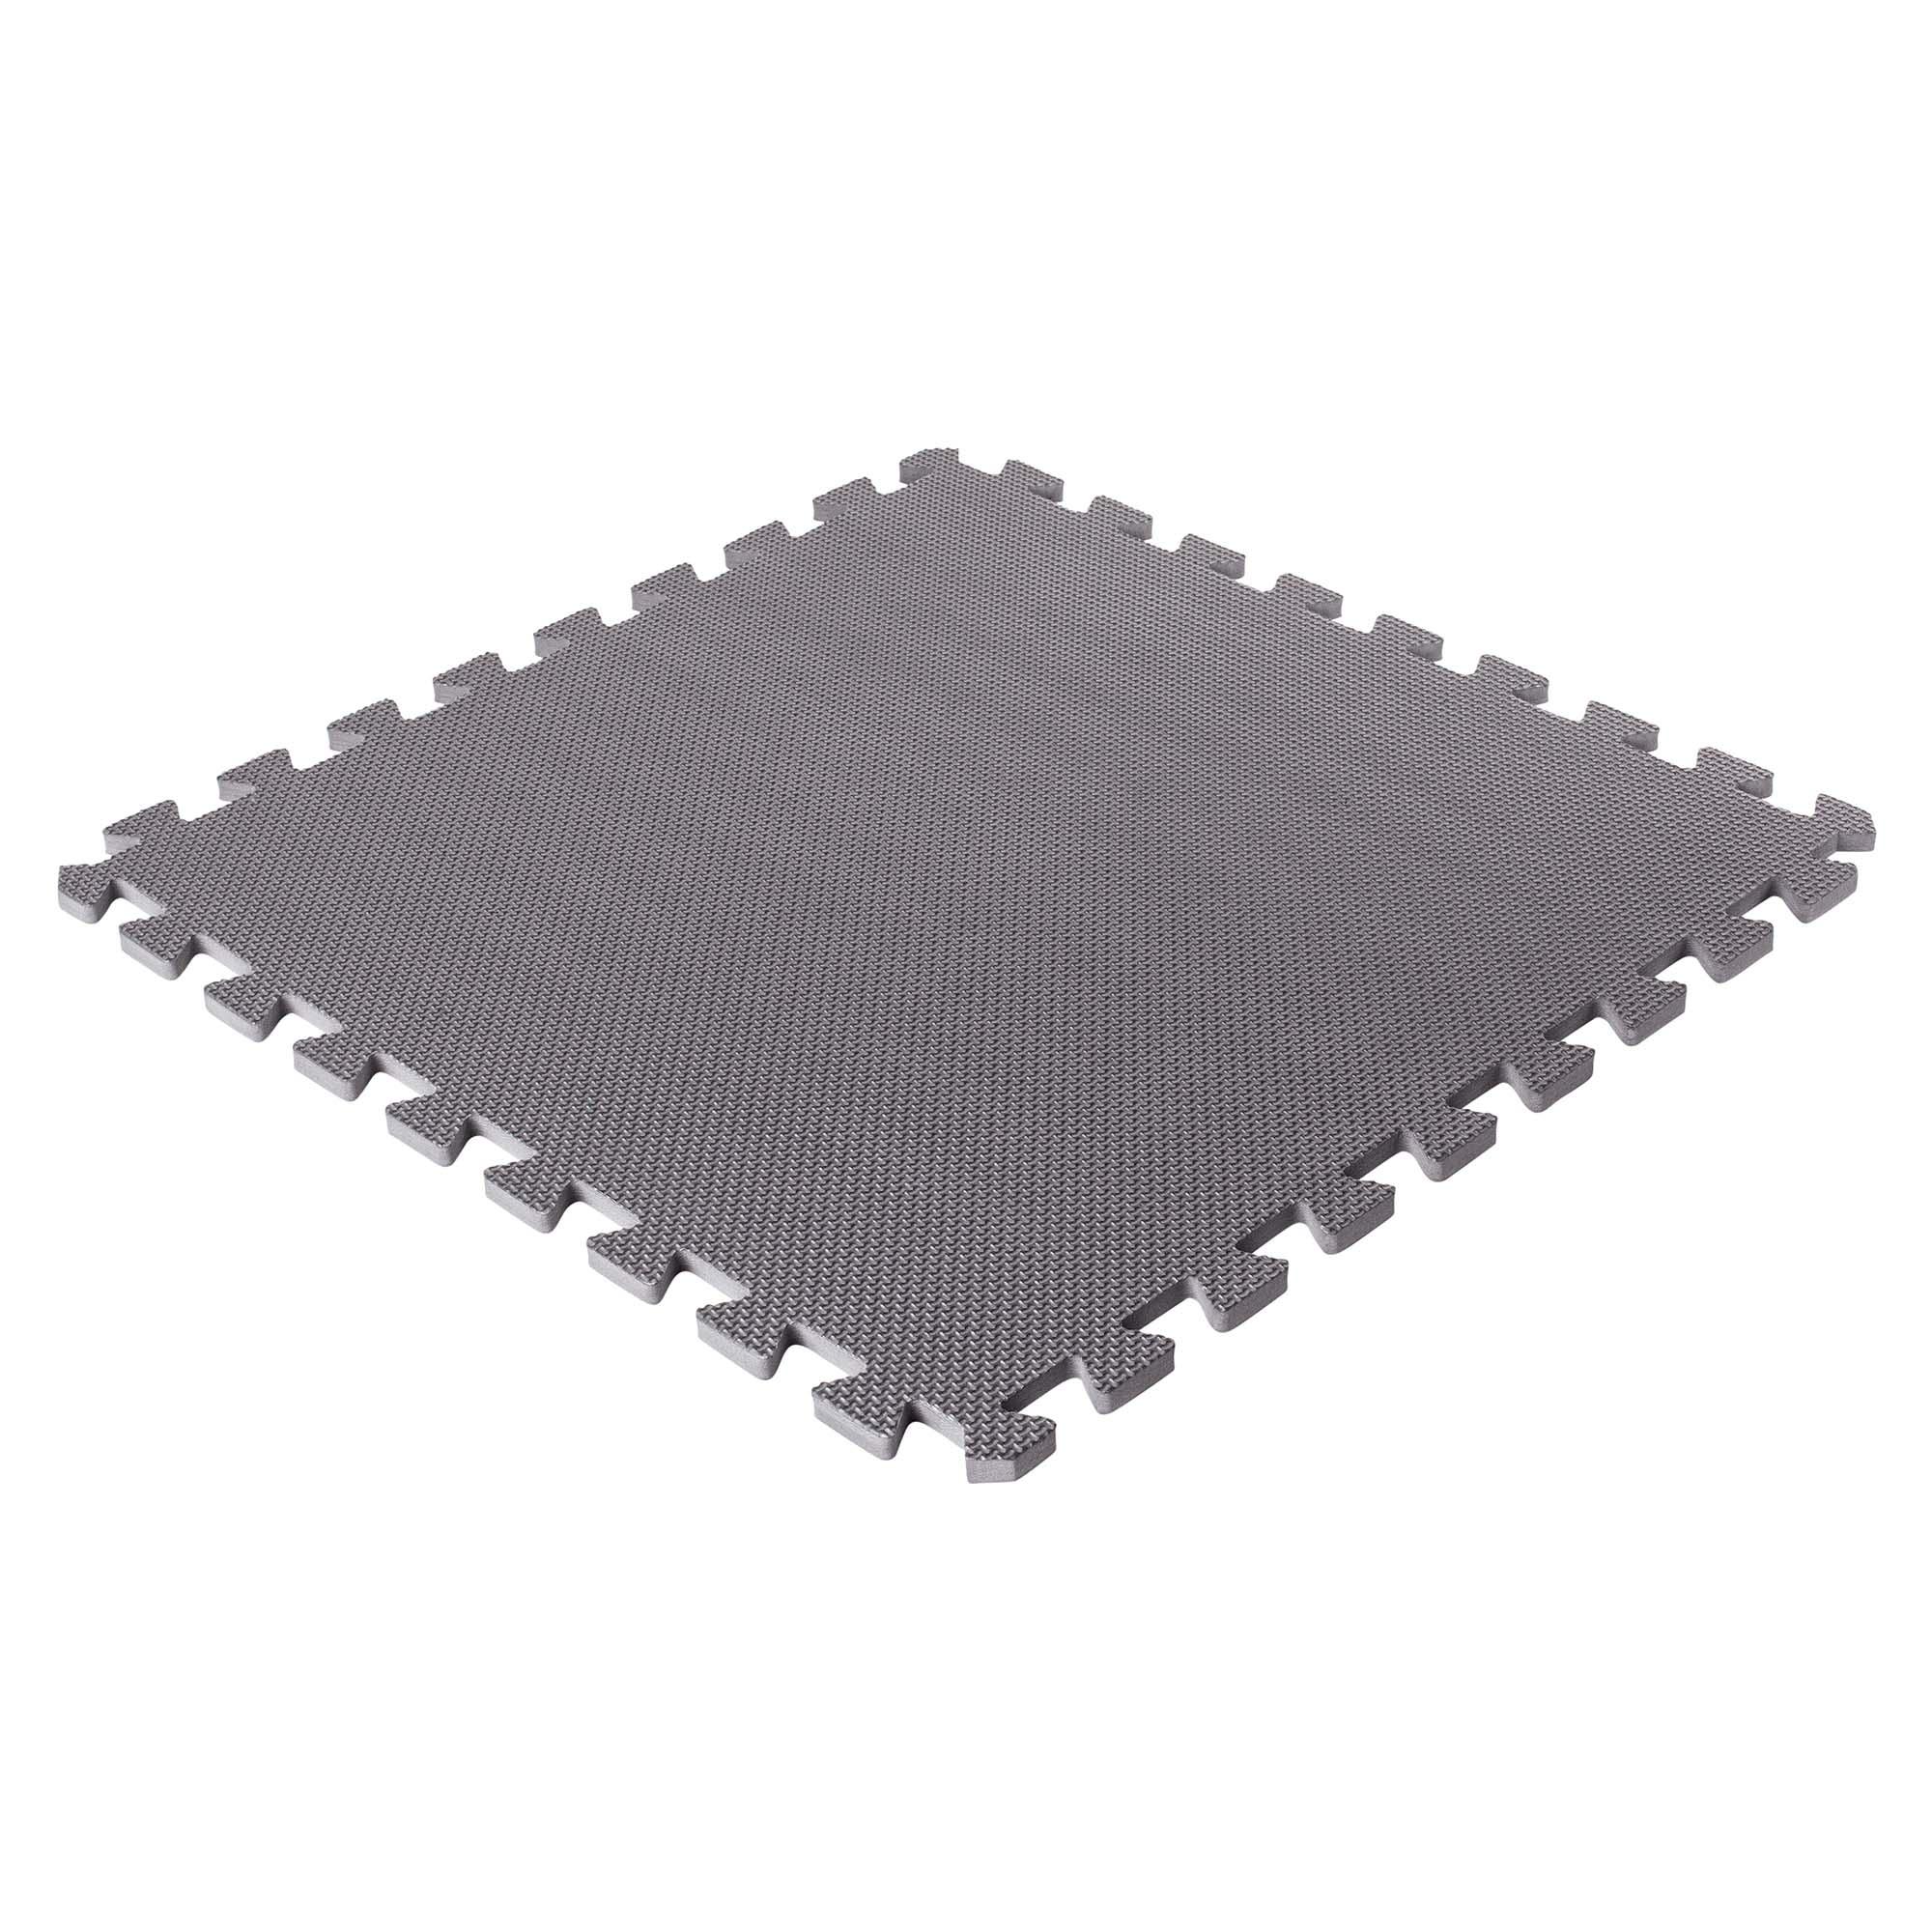 Bodenschutzmatten, grau, 500x500x8mm (8 Stück im Set = 2qm)